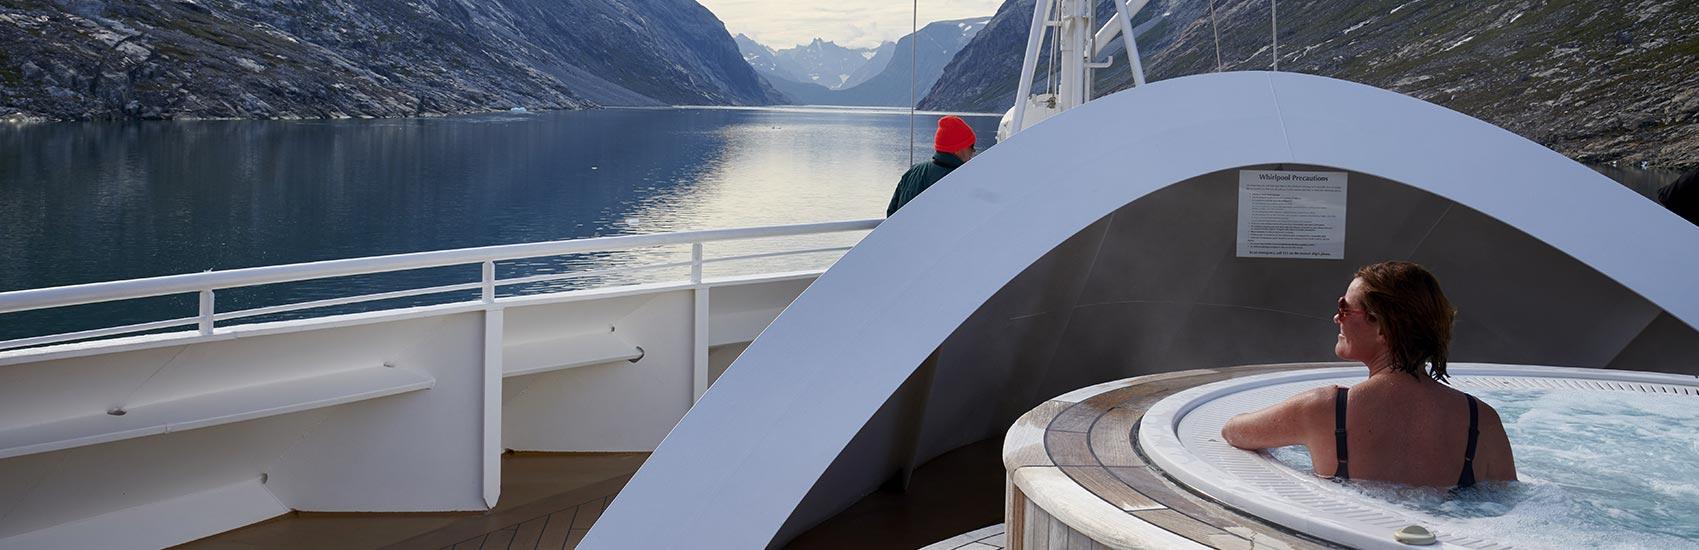 Early Bonus Savings to the Arctic with Seabourn 2